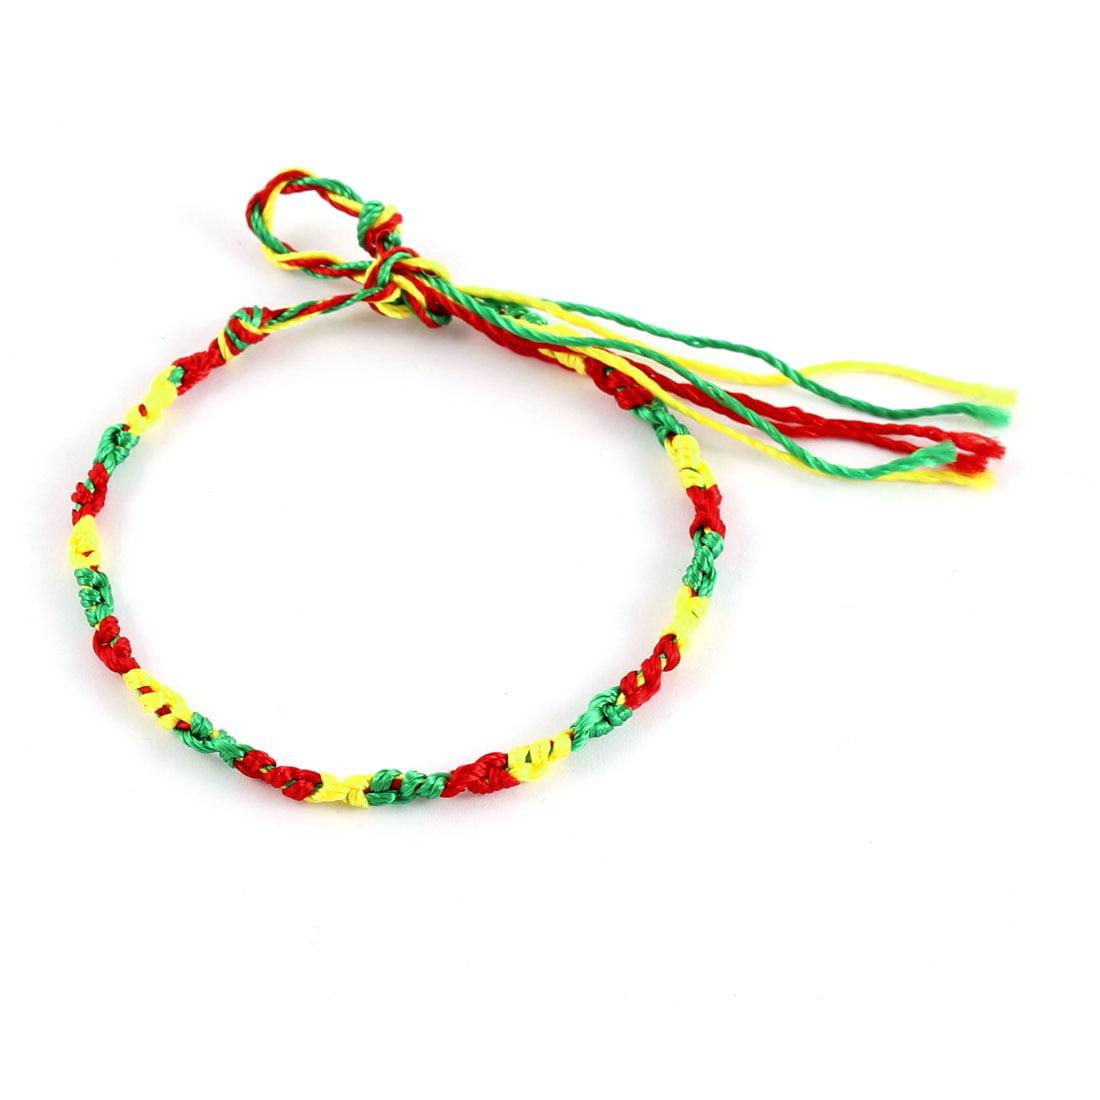 Ladies Women Braided String Bracelet Bangle Green Red Yellow - image 2 de 2